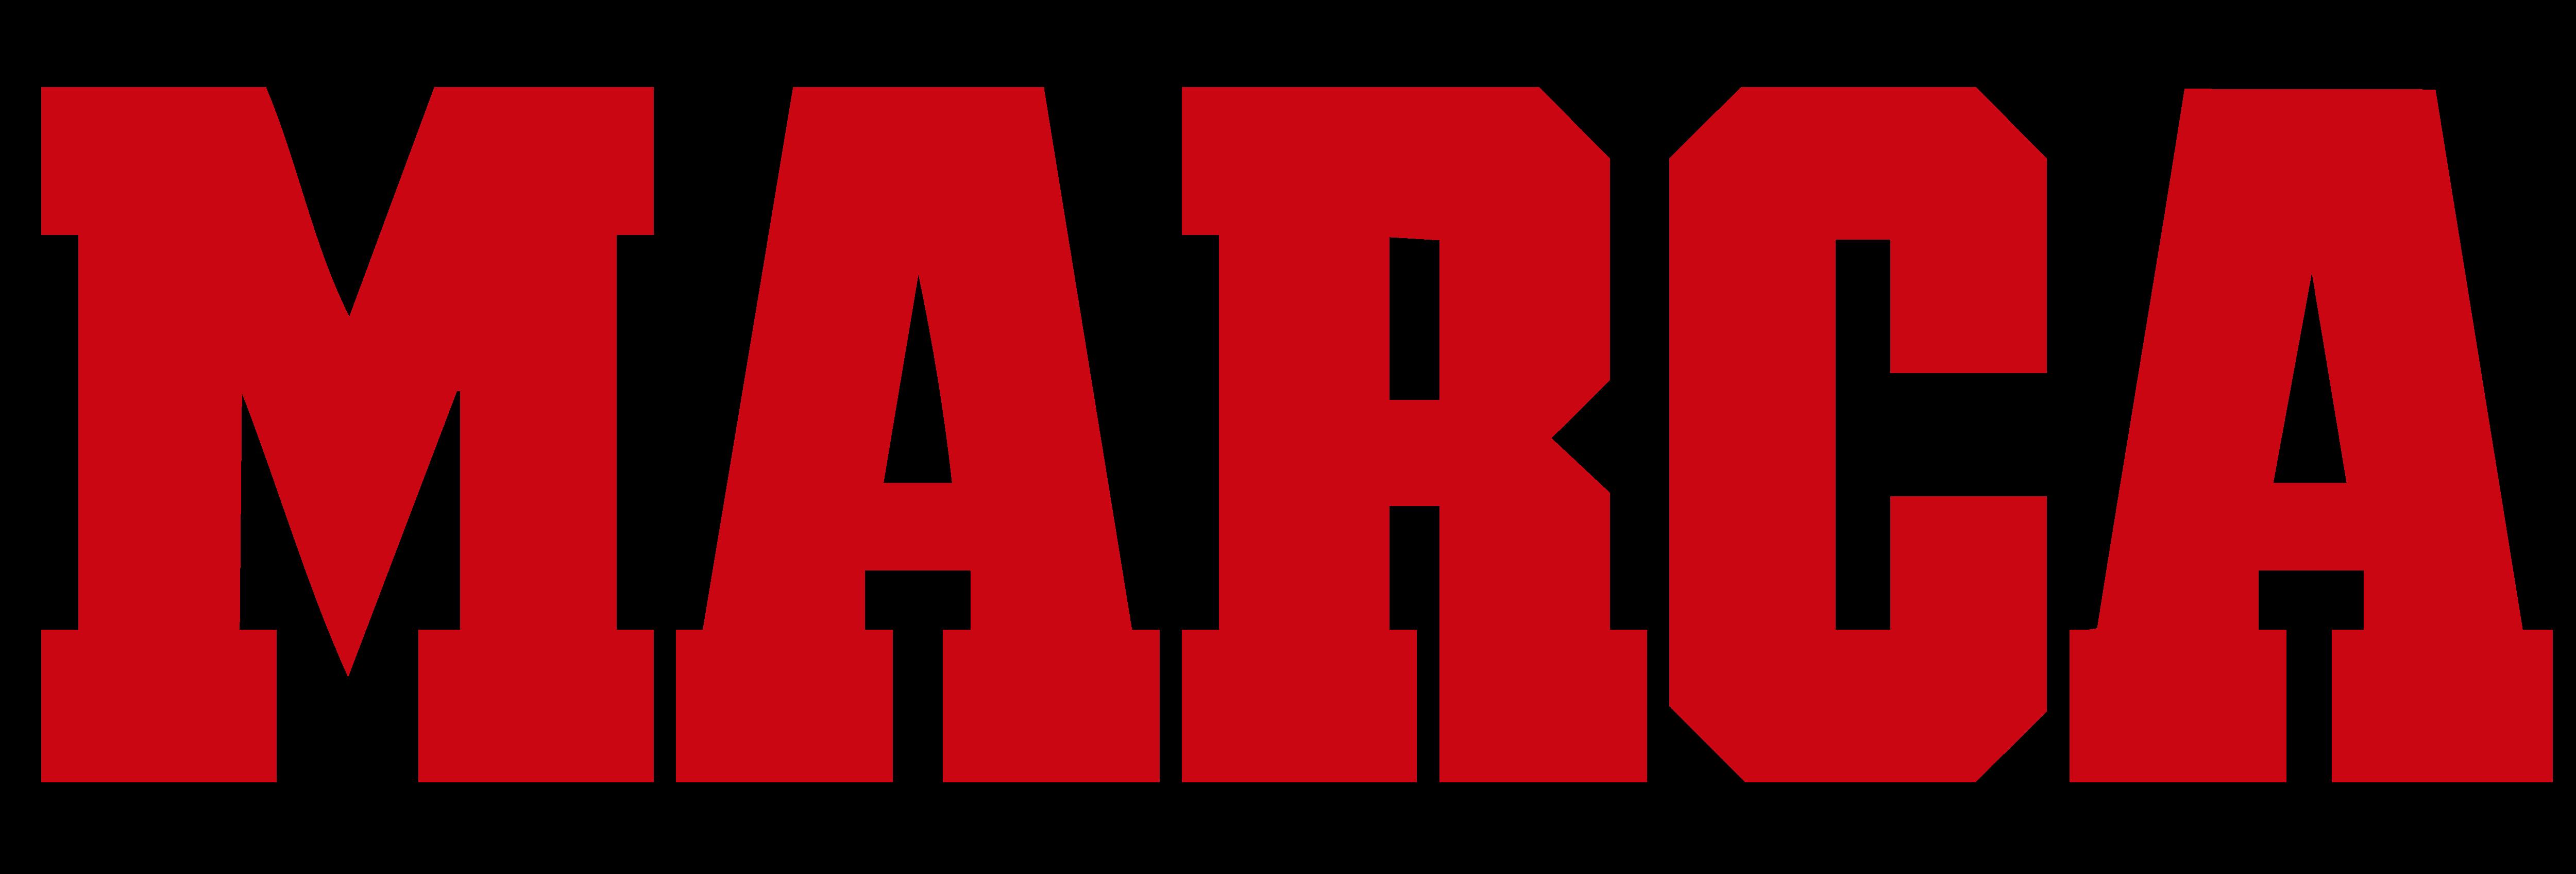 marca logos download